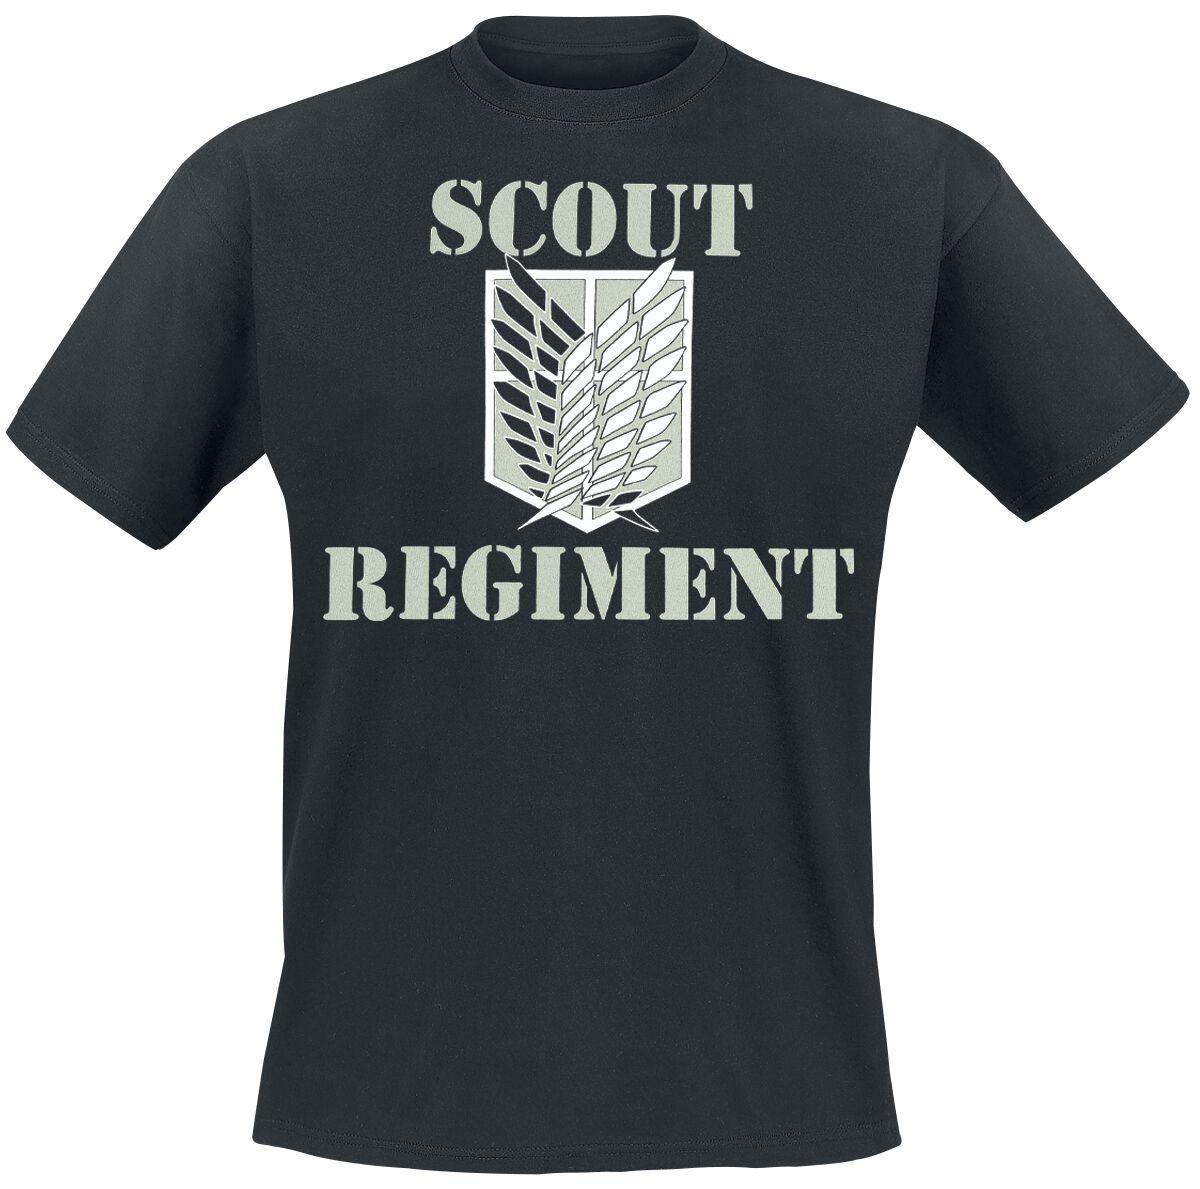 Image of Attack On Titan Scout Regiment T-Shirt schwarz